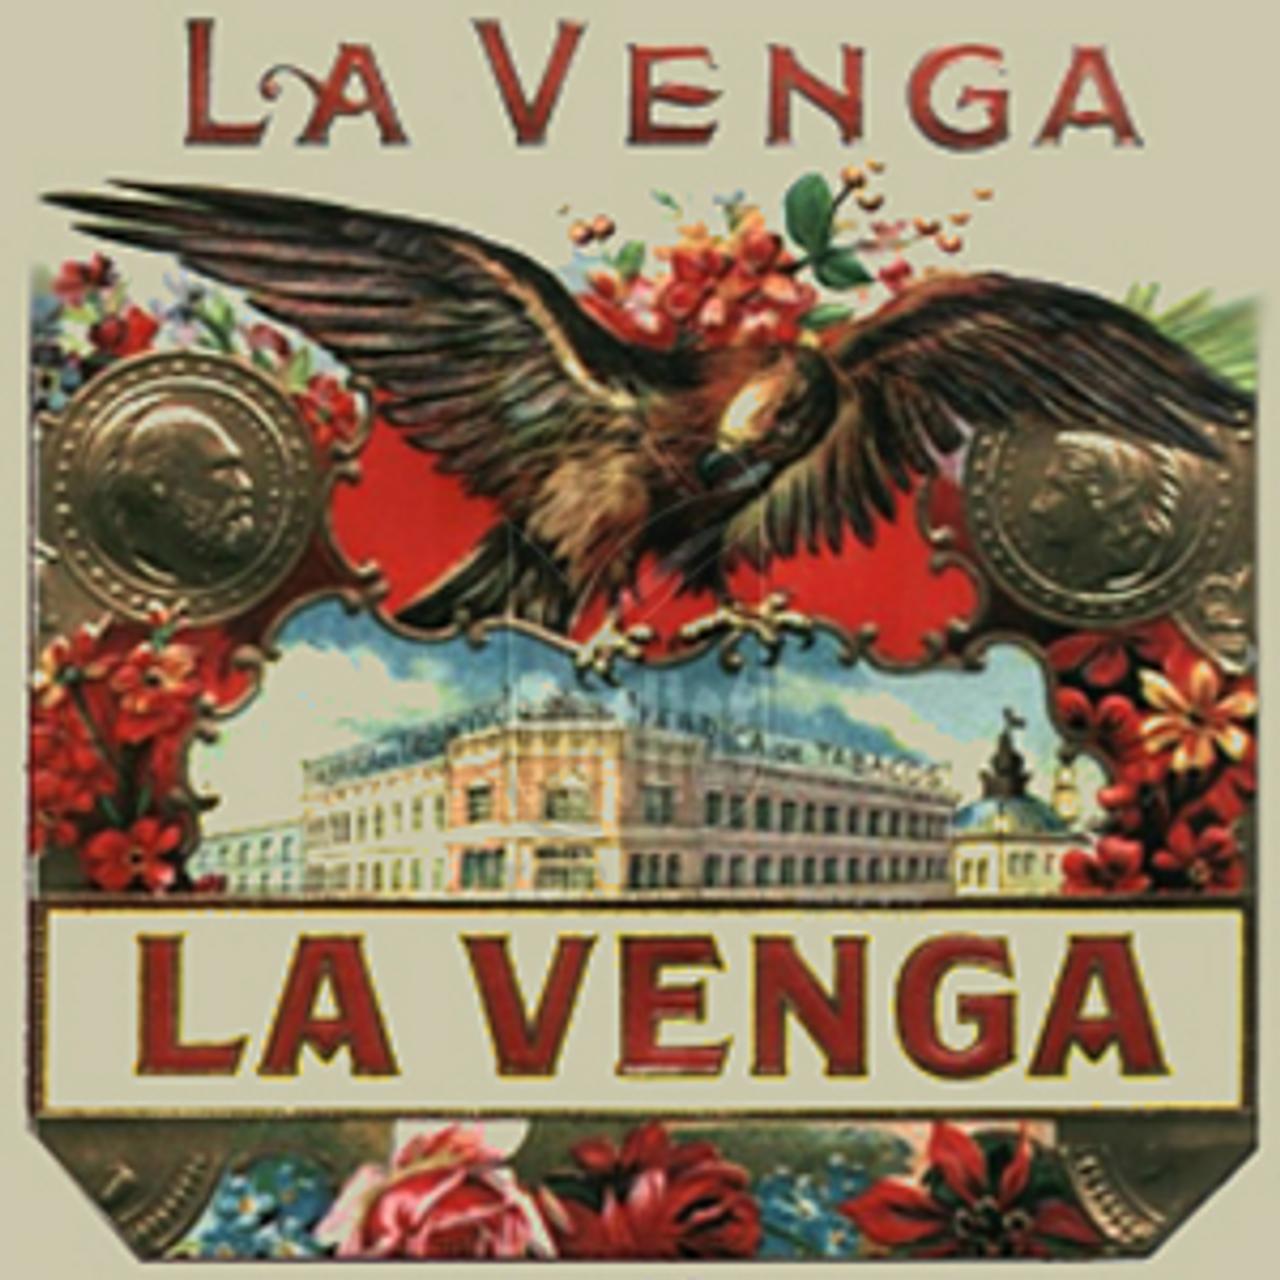 La Venga No.10 Maduro Cigars - 5 1/2 x 52 (Bundle of 20)